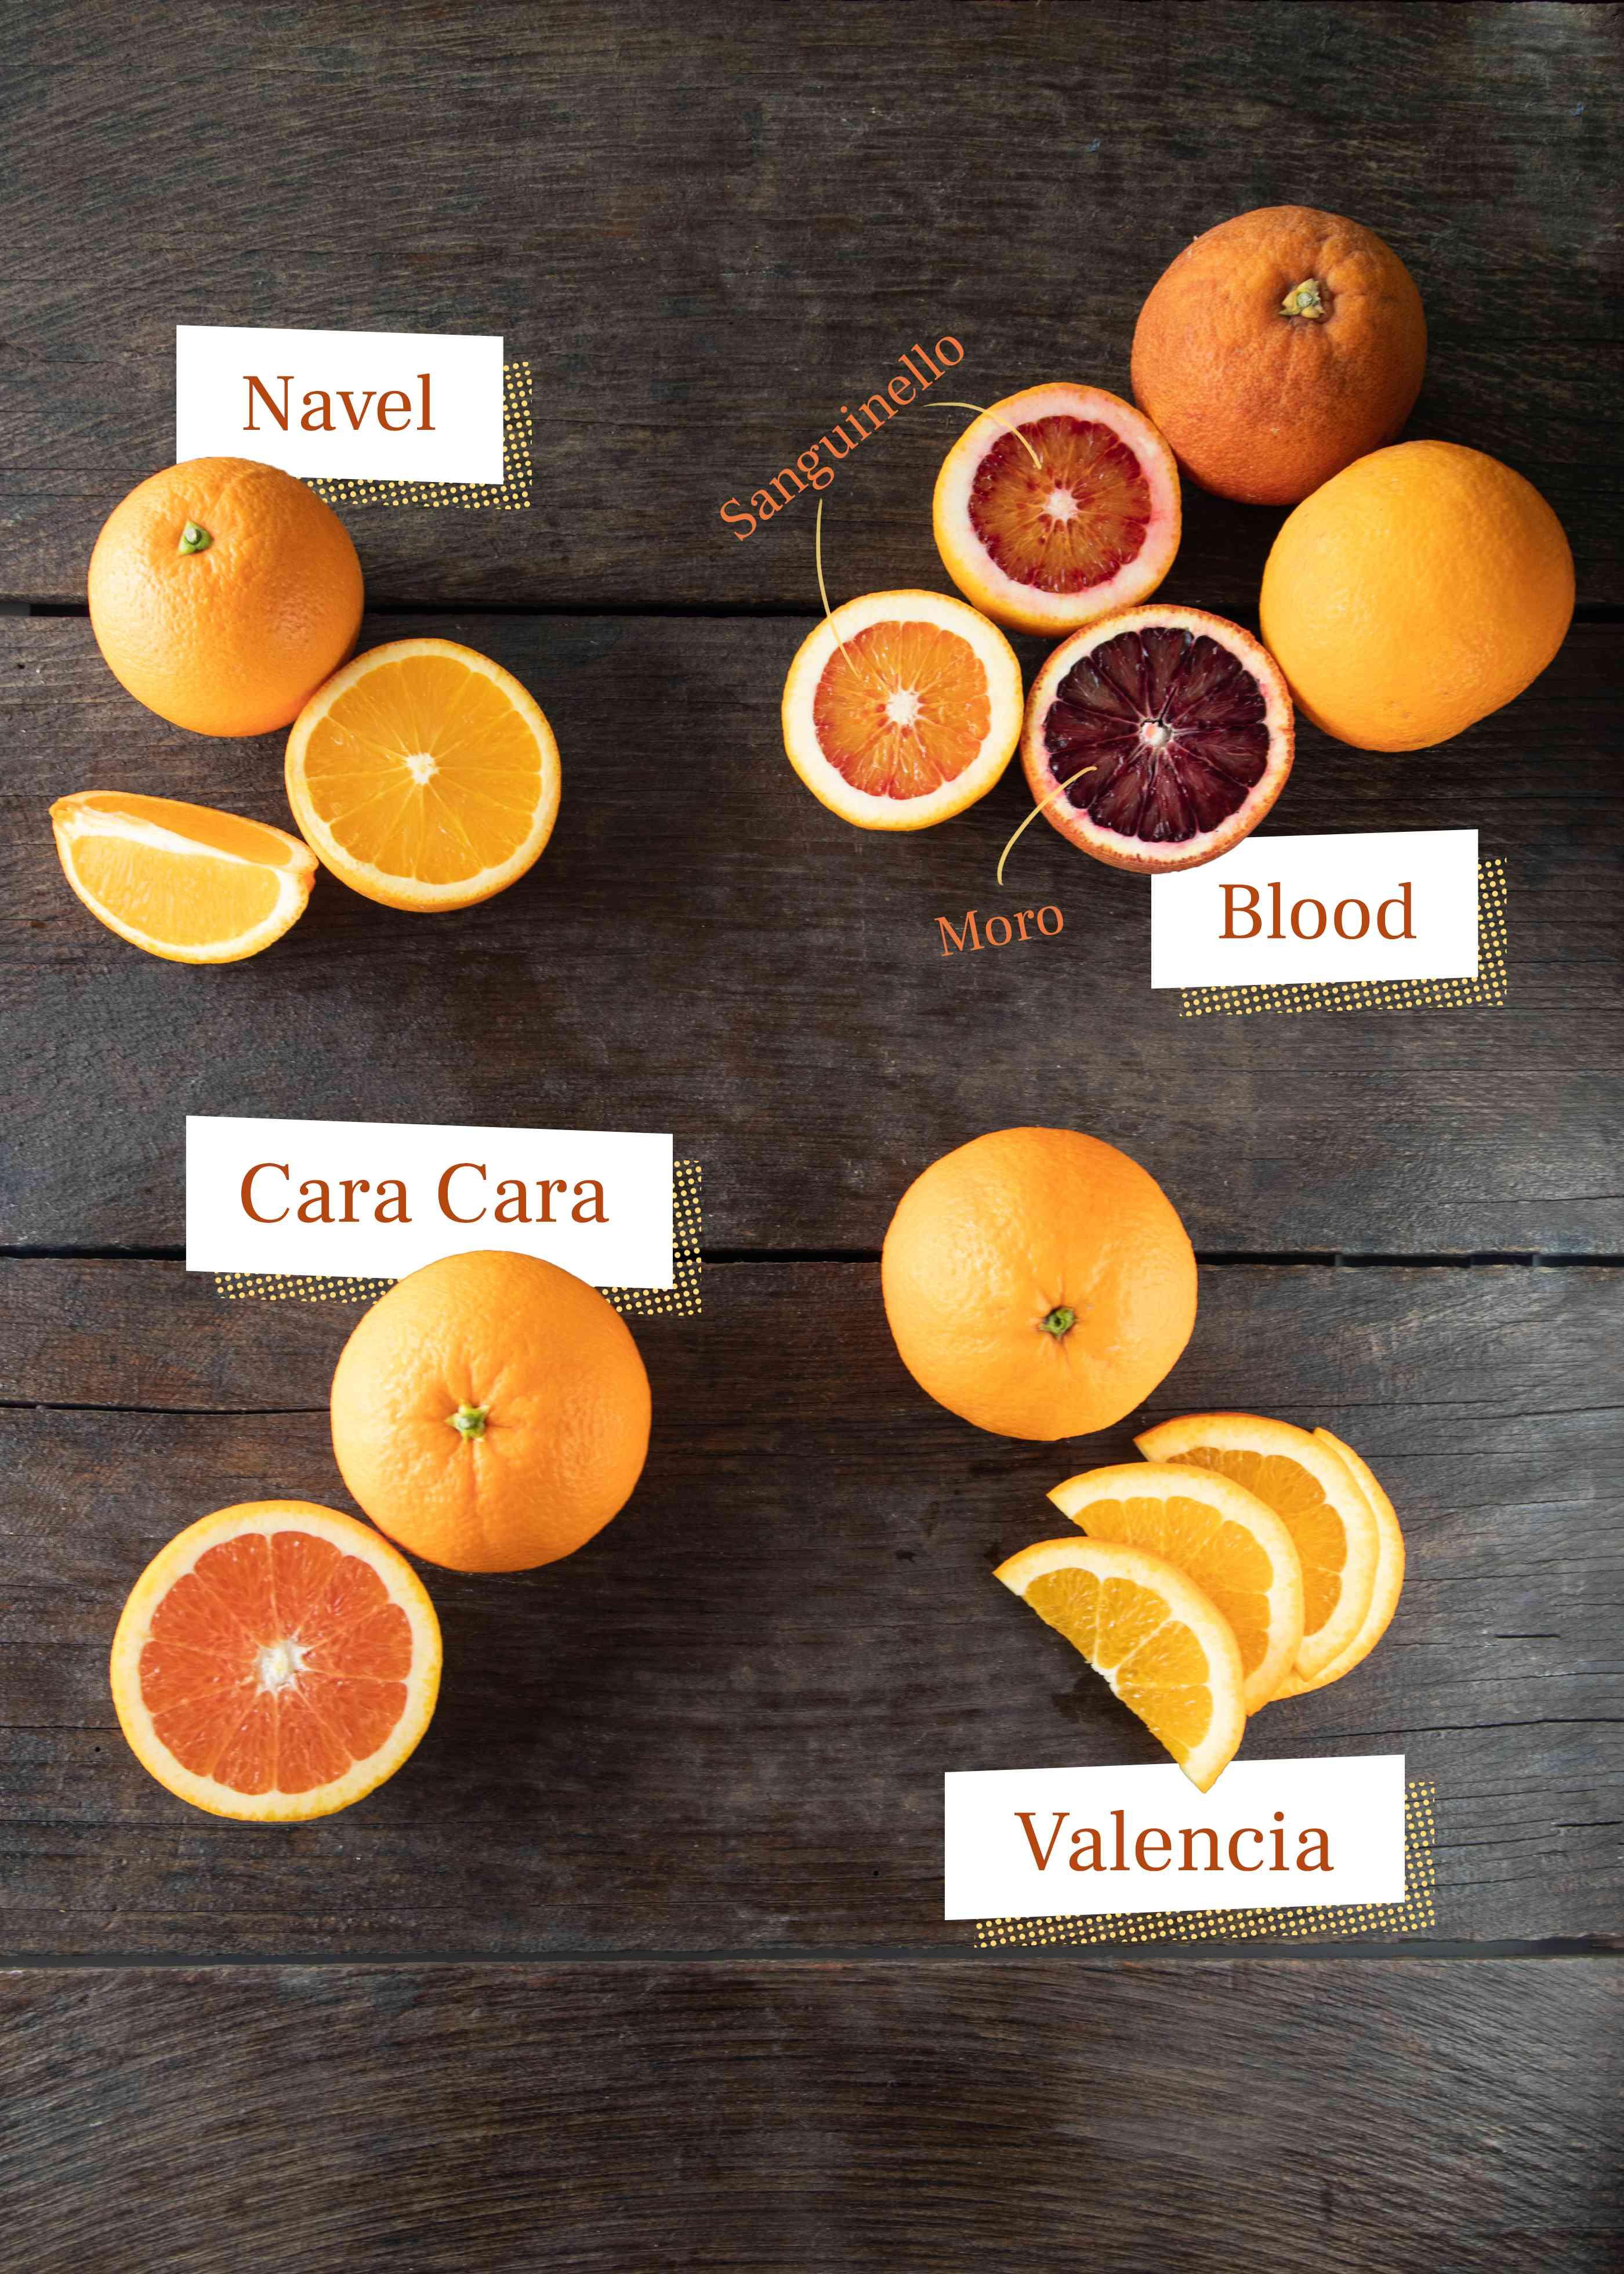 Navel, blood, Cara Cara, and Valencia oranges on dark background